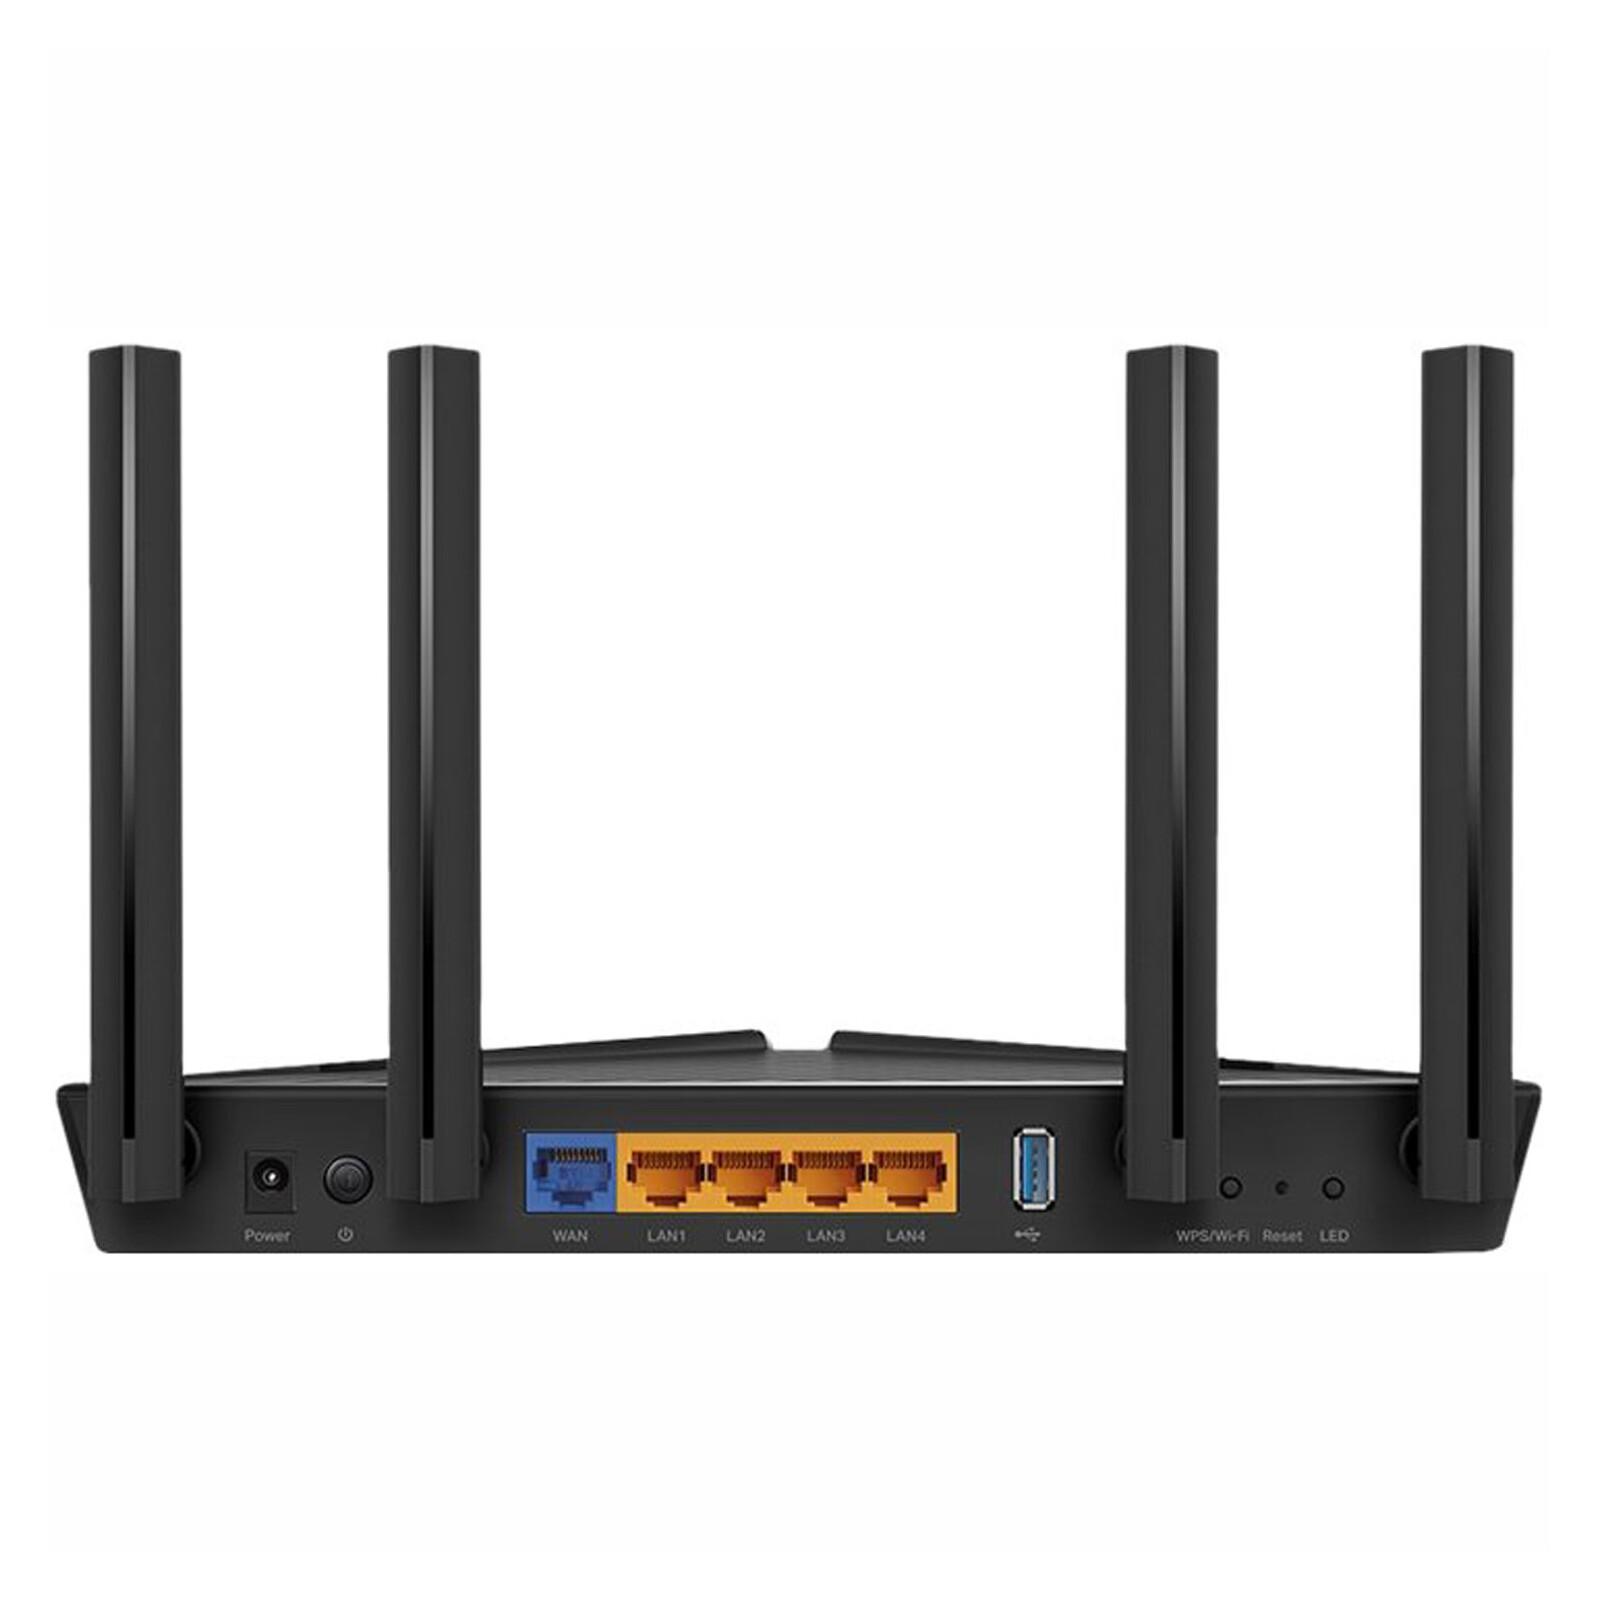 TP-Link AX3000 Wi-Fi 6 Router Dual-Core CPU 24